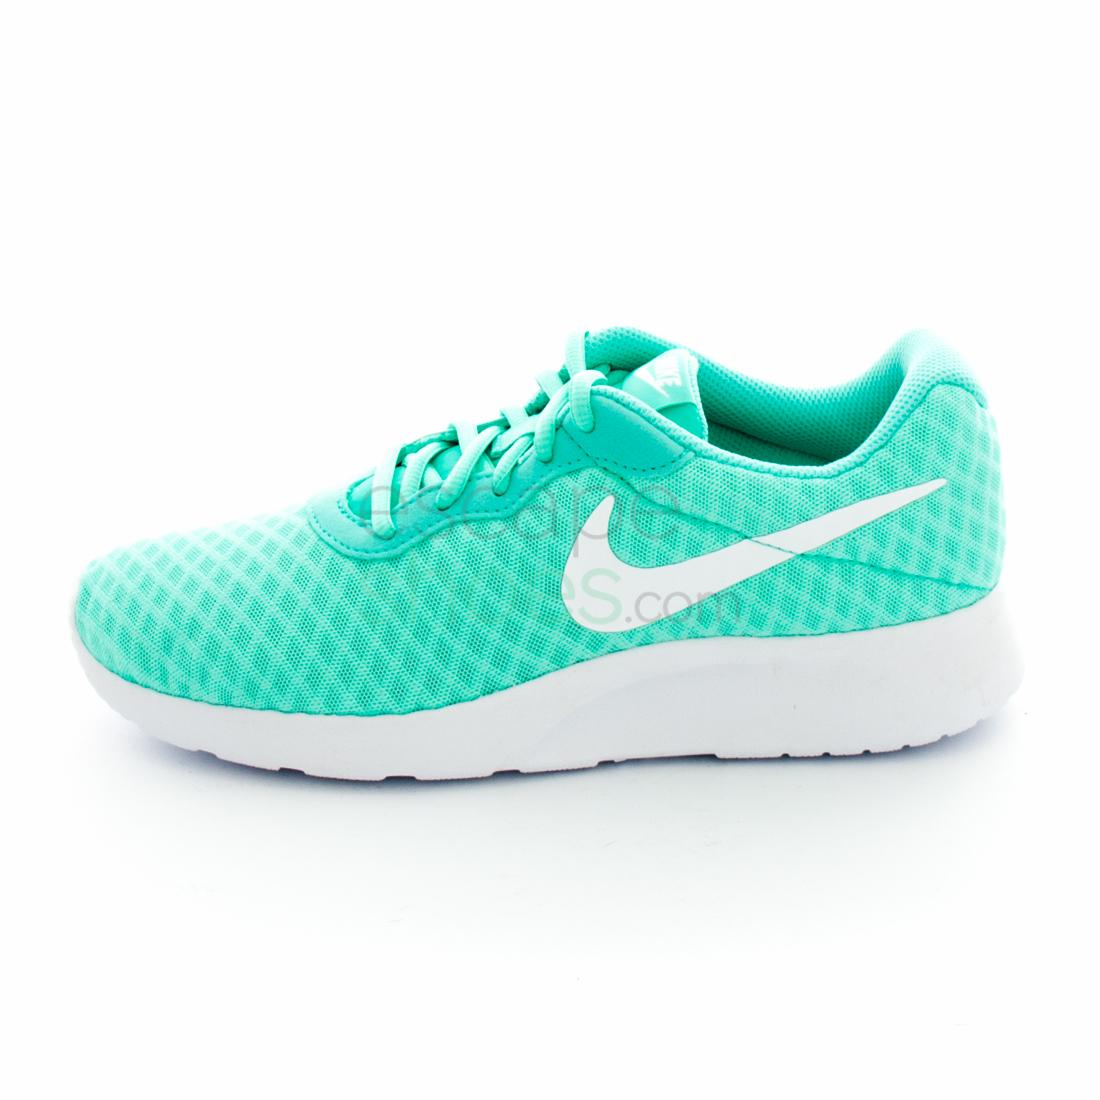 menta Becks Dando  Sneakers NIKE Tanjun SE Hyper Turquoise White 844908 310